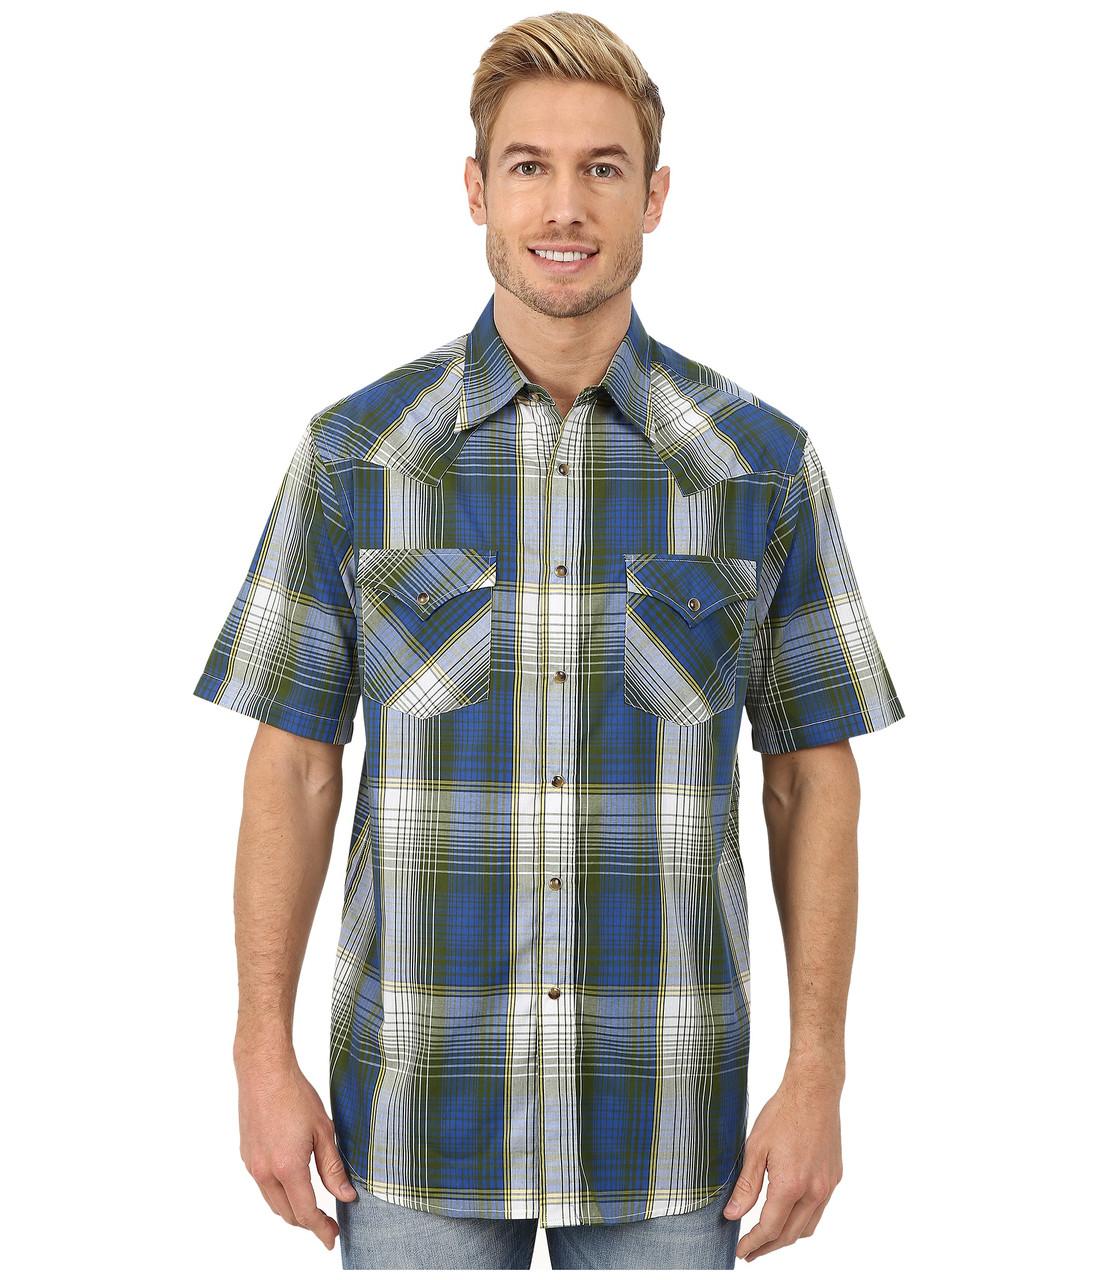 Рубашка Pendleton, M, Blue/Green, DA069-66905-R